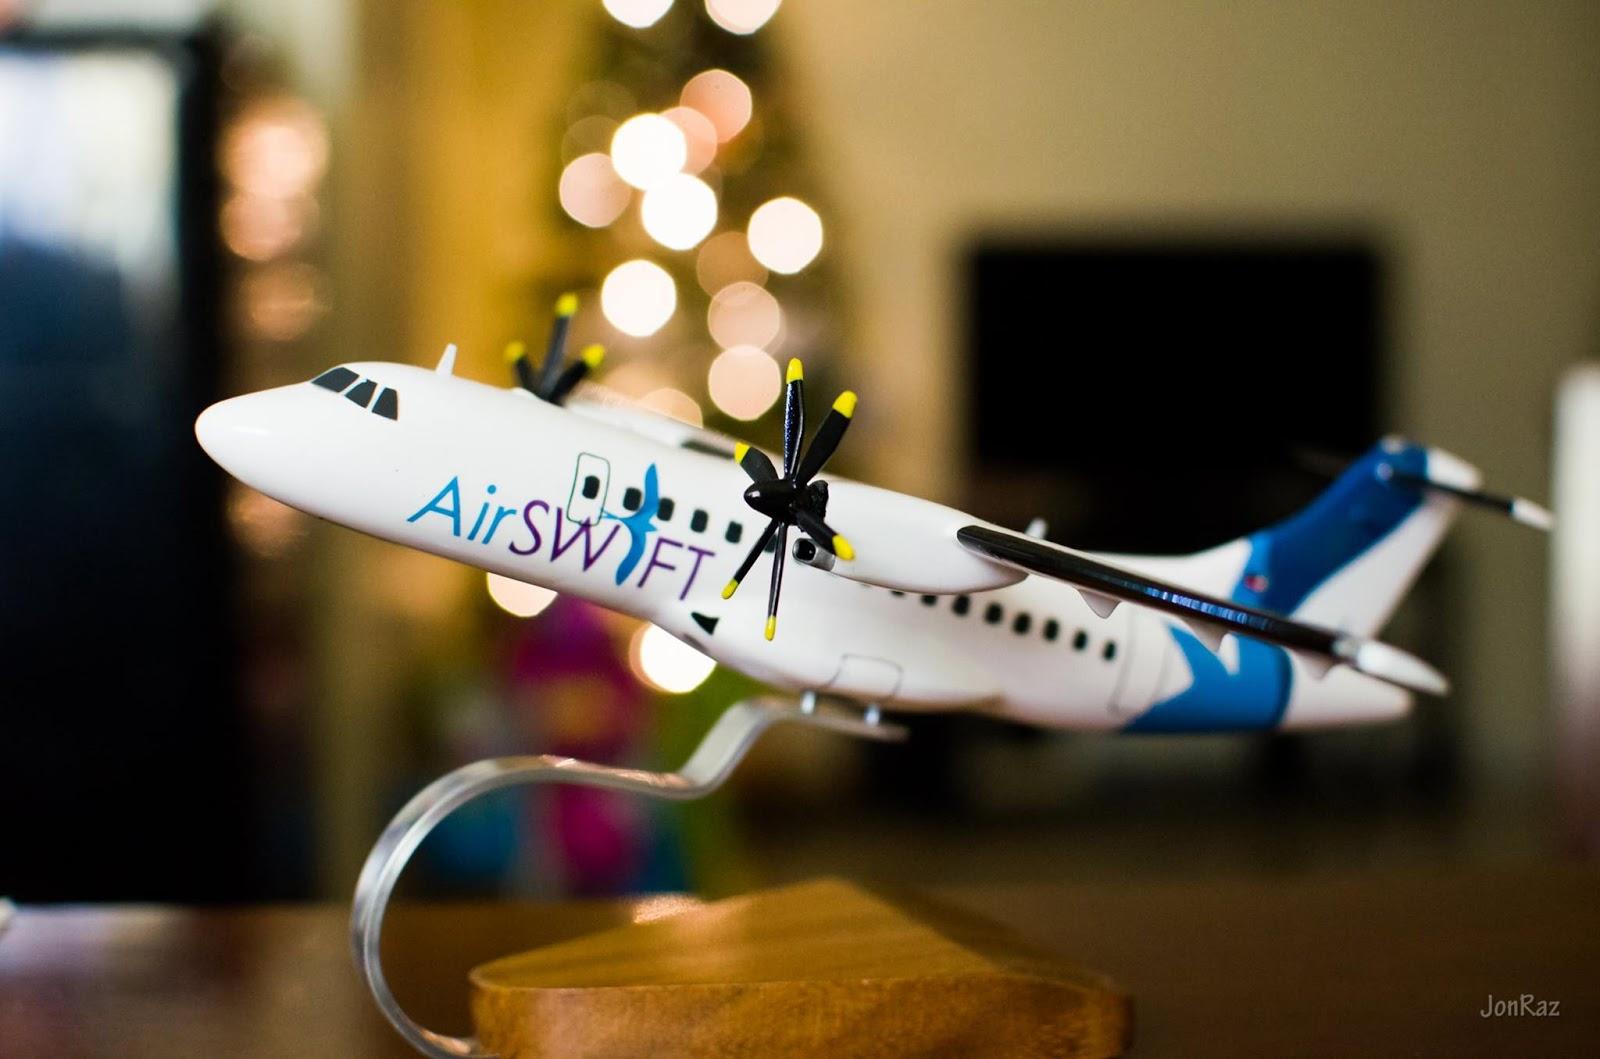 AirSwift Toy Plane